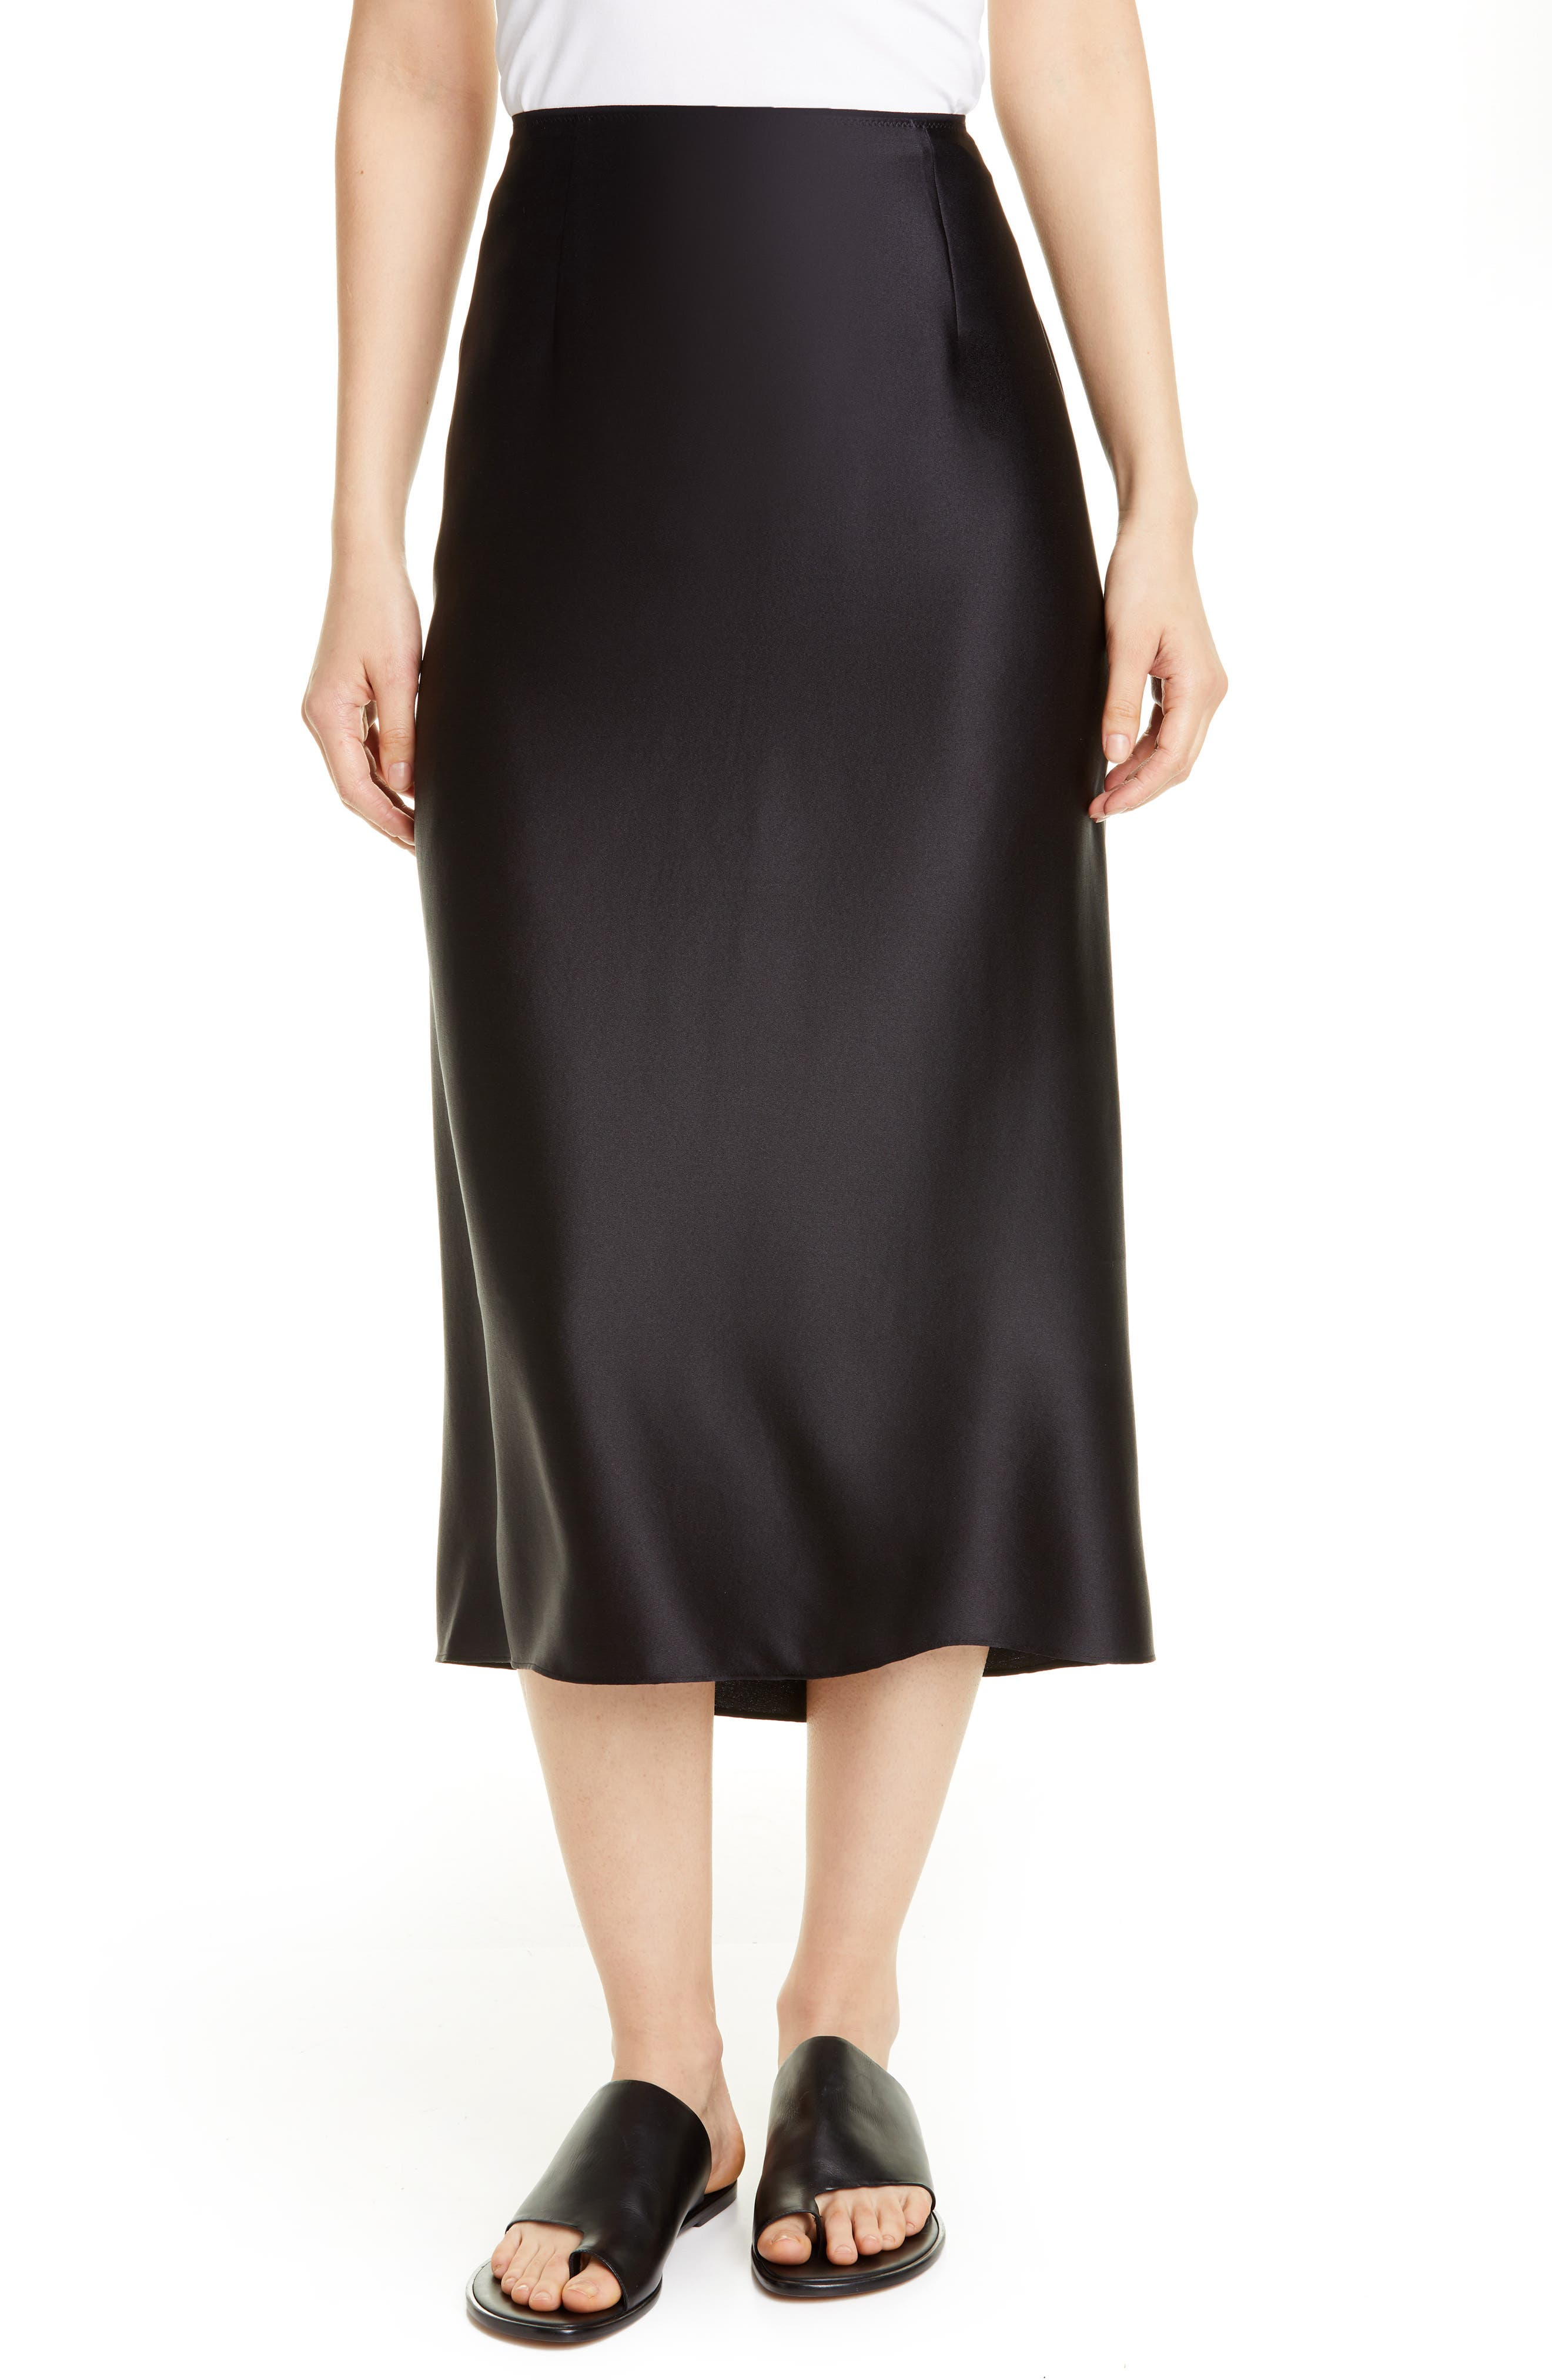 1920s Style Underwear, Lingerie, Nightgowns, Pajamas Womens Vince Silk Slip Skirt Size 10 - Black $275.00 AT vintagedancer.com